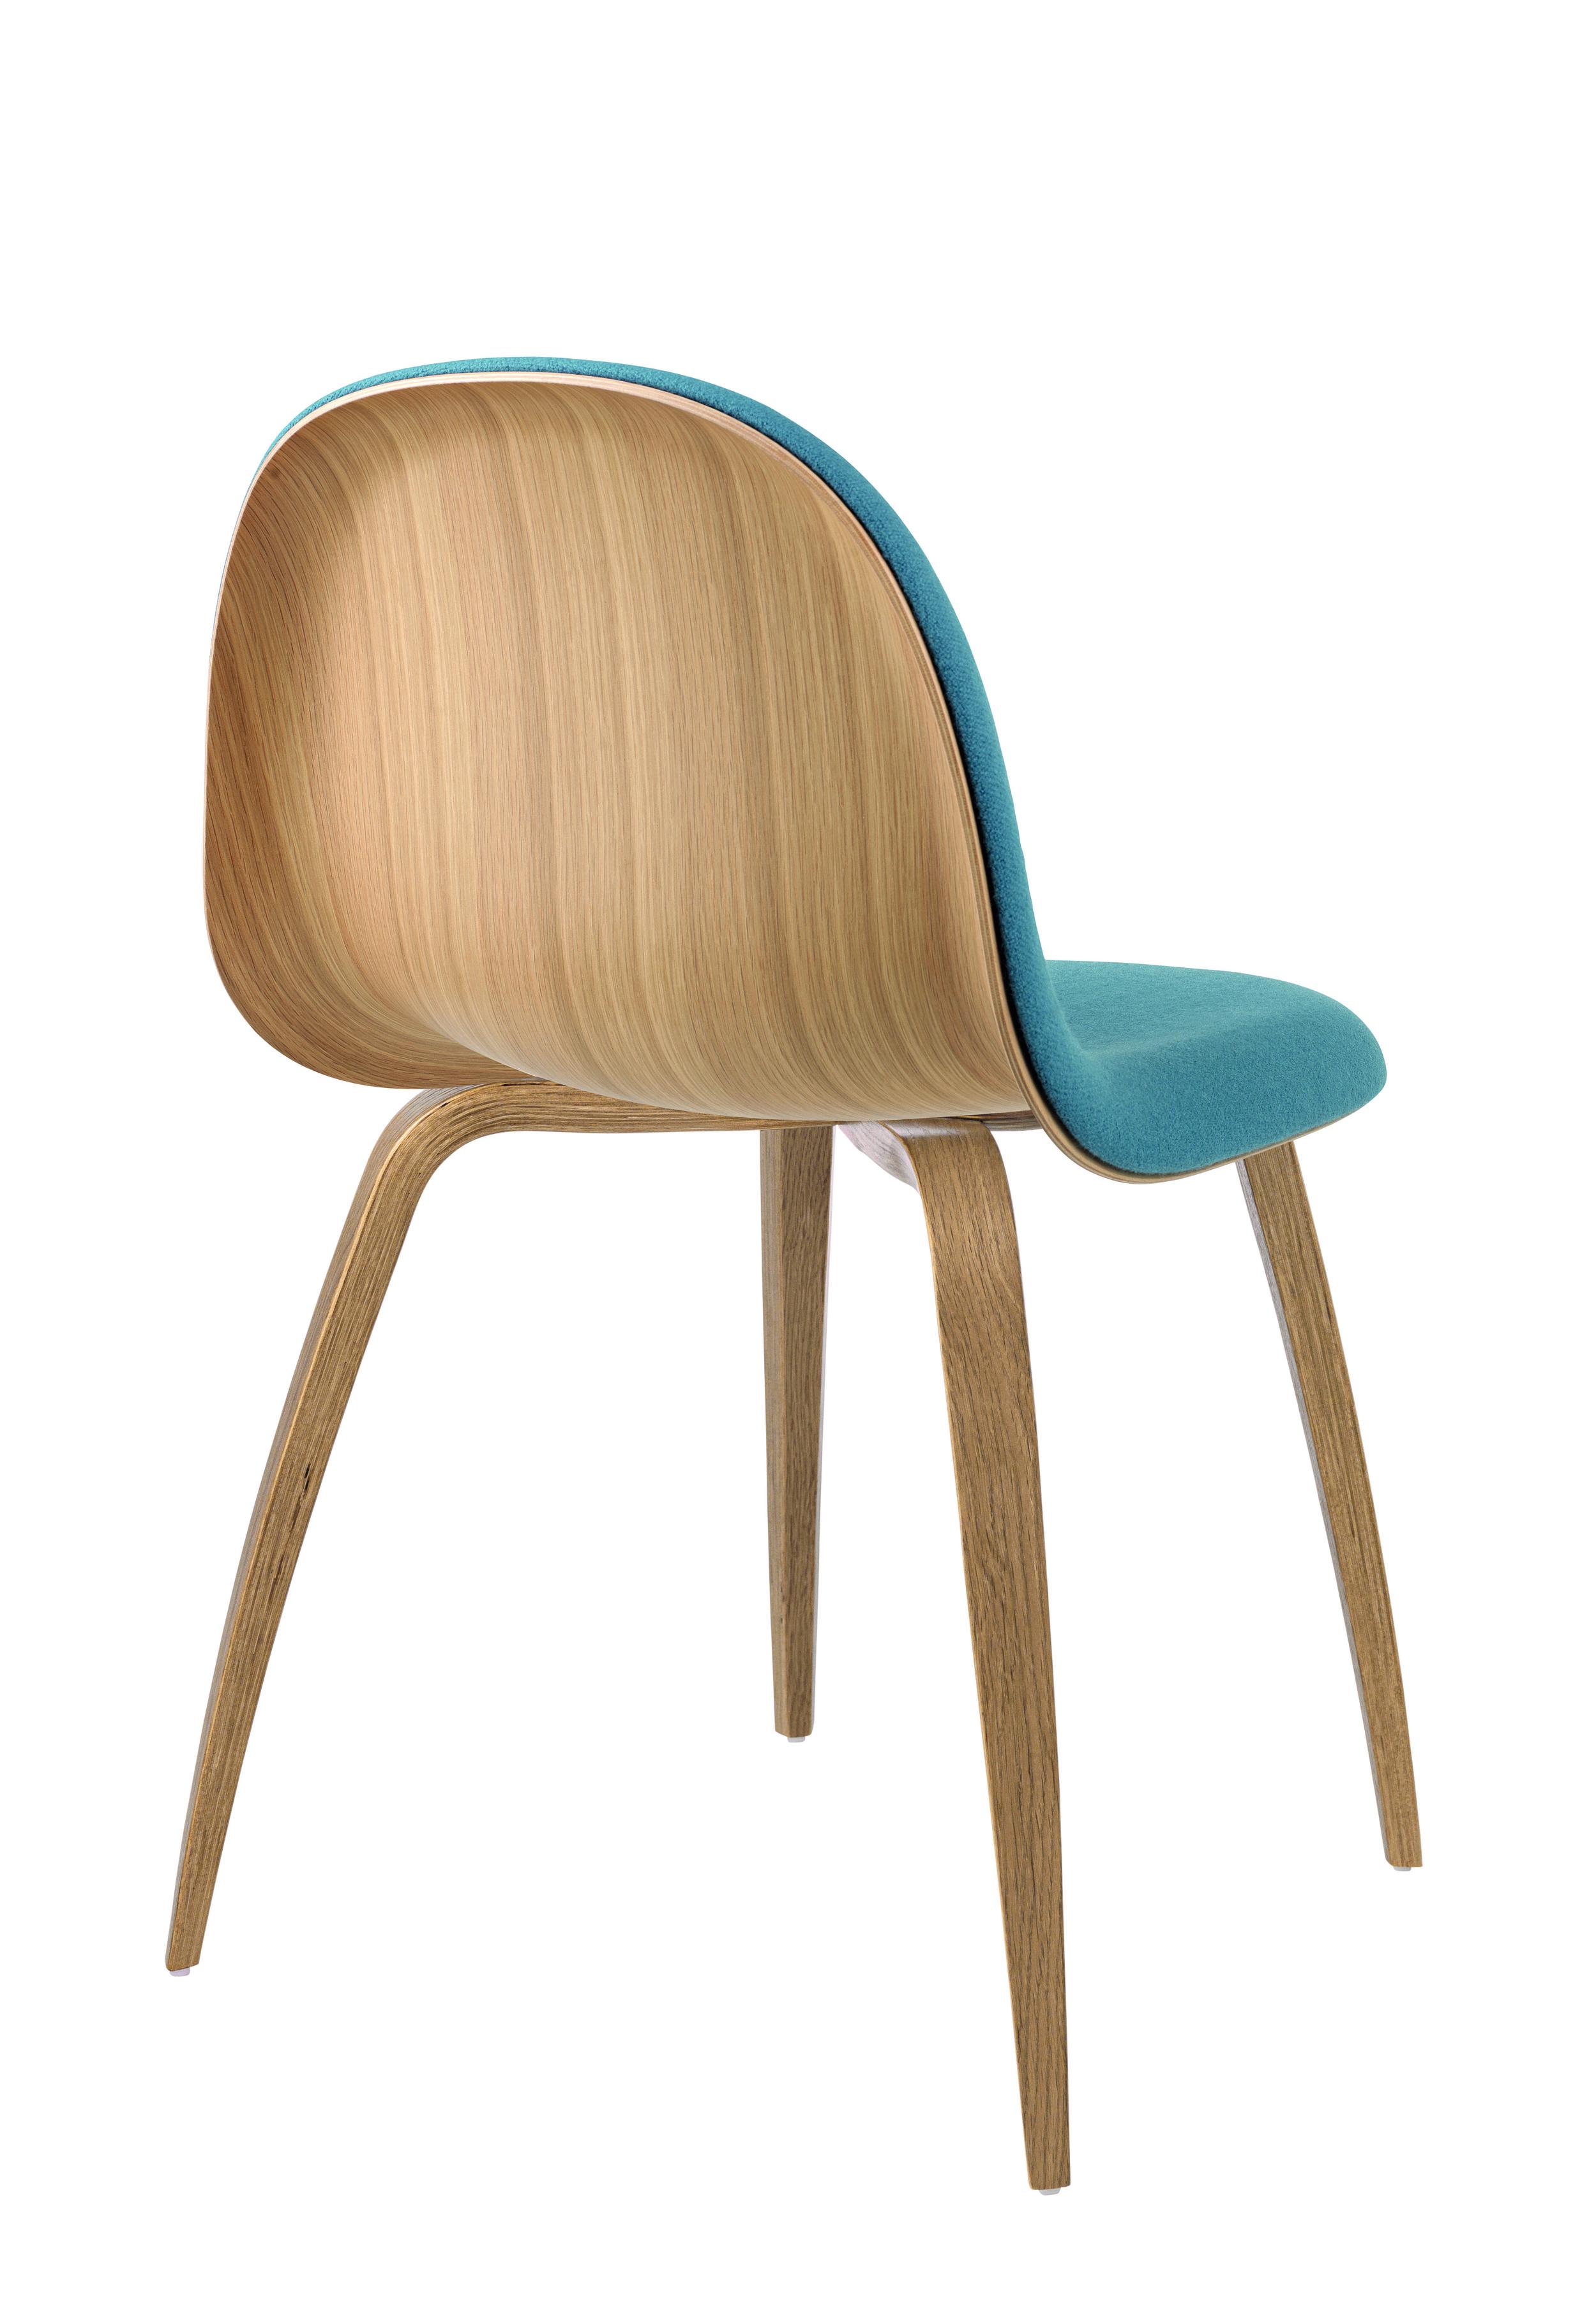 Gubi 52 Chair_Front Upholstered with Tonus colour 627 grey-blue_Oak Base_Back.jpg